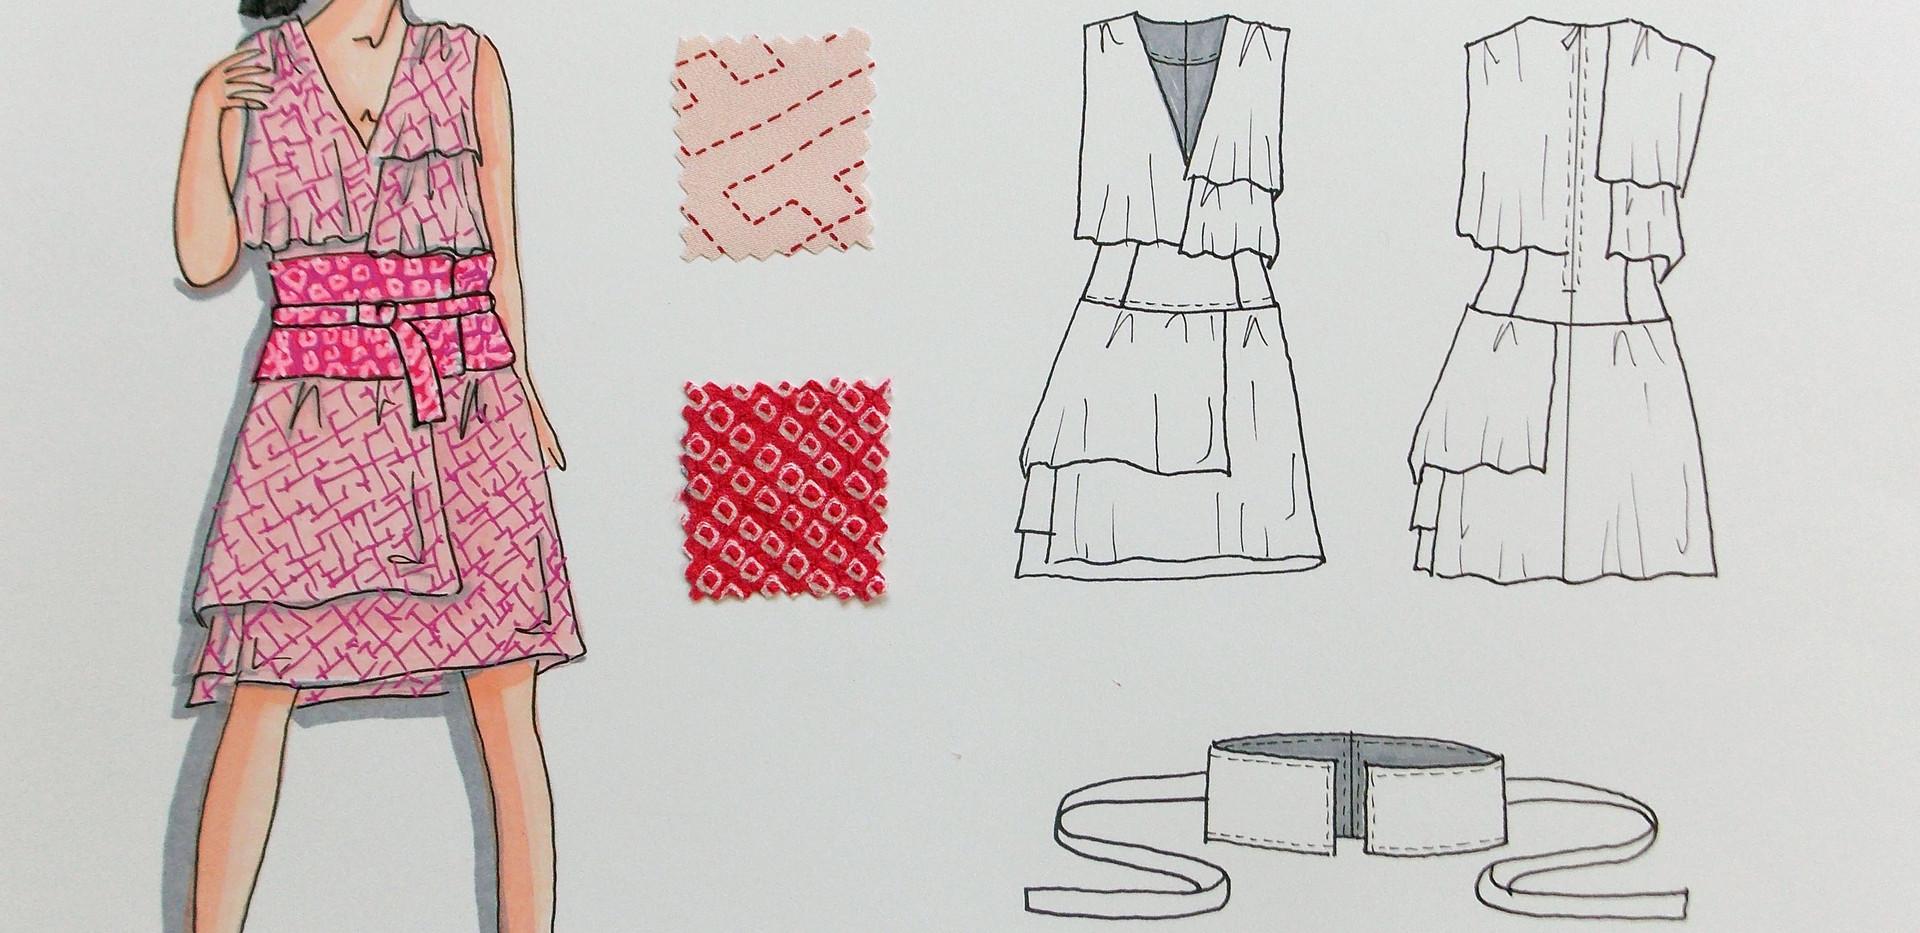 Sayonara Flat designs